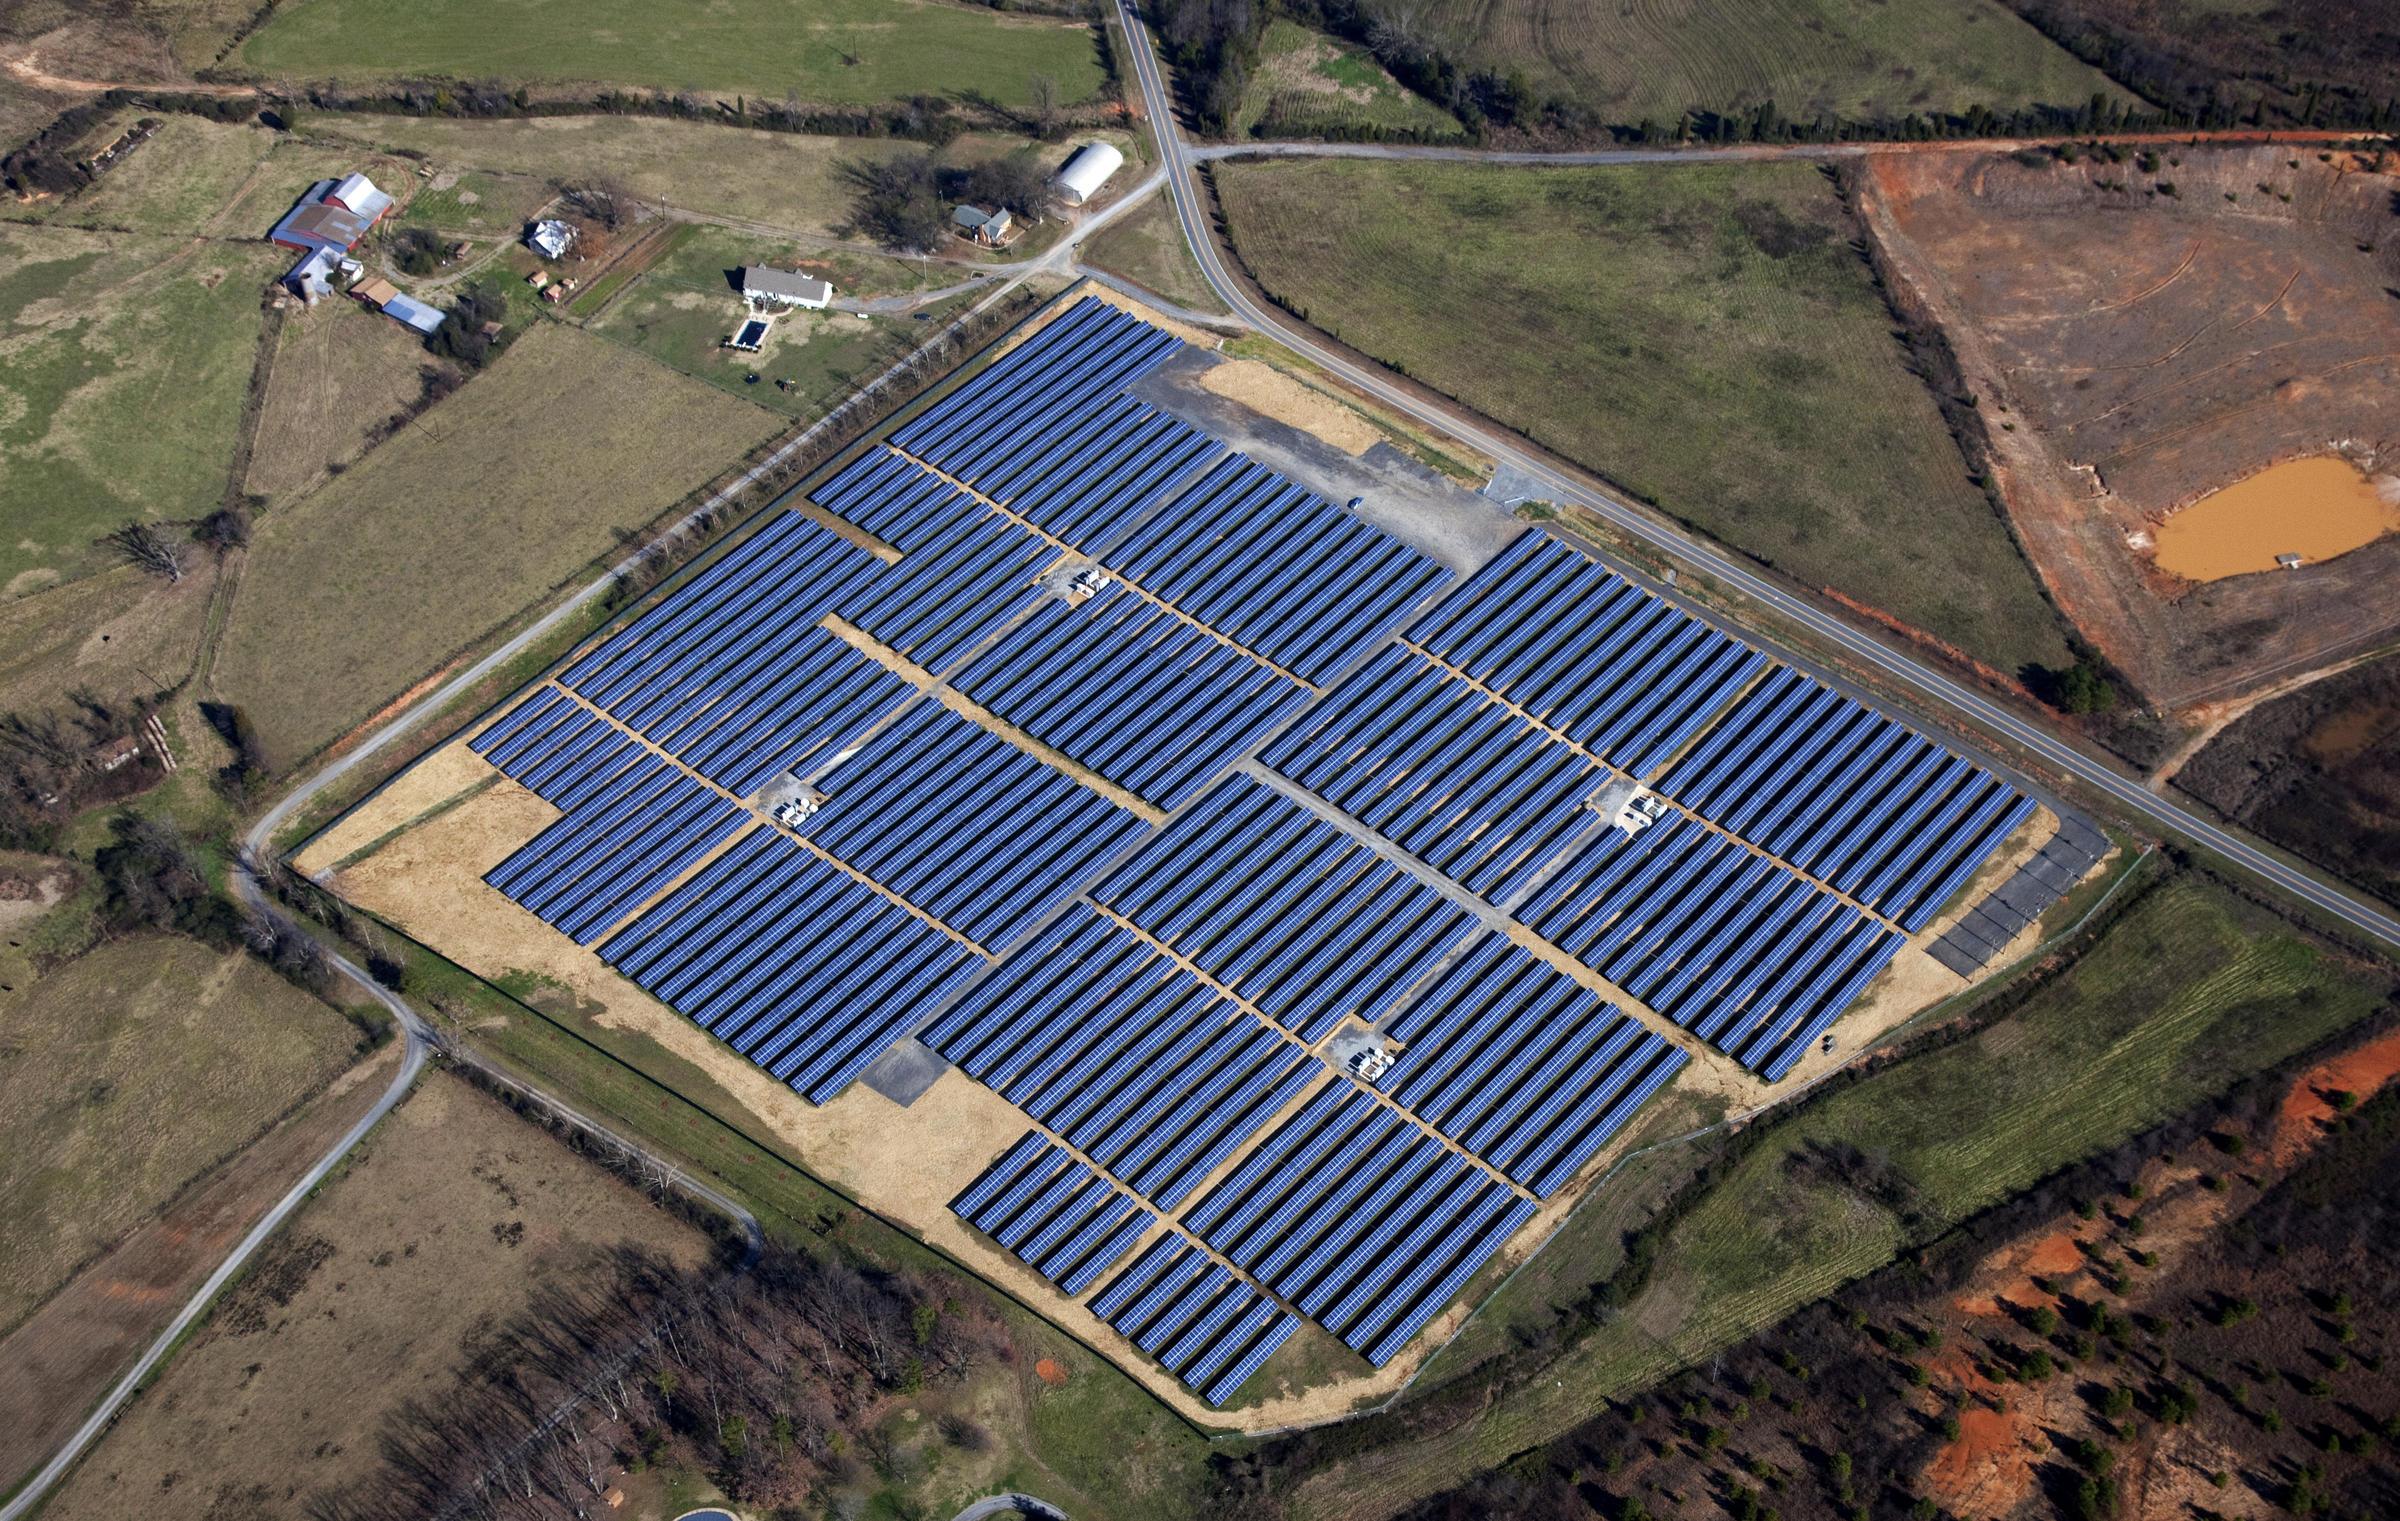 35 acre solar farm under construction in orange county wunc for Solar ranch